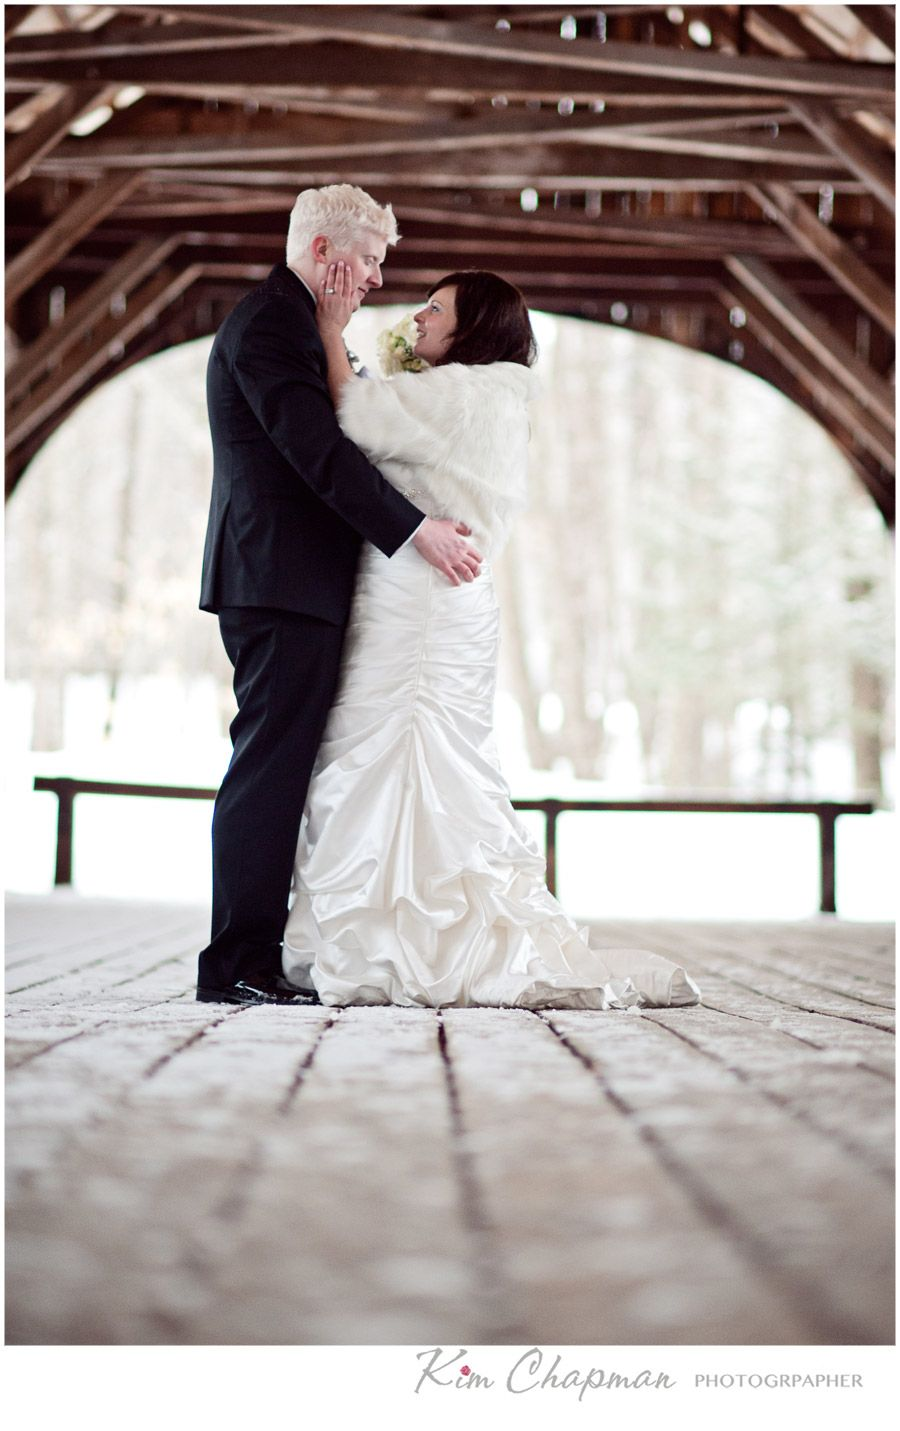 Elsbeth and David • A Sunday River Wedding • Newry, Maine • 3/22/14 » Kim Chapman Blog